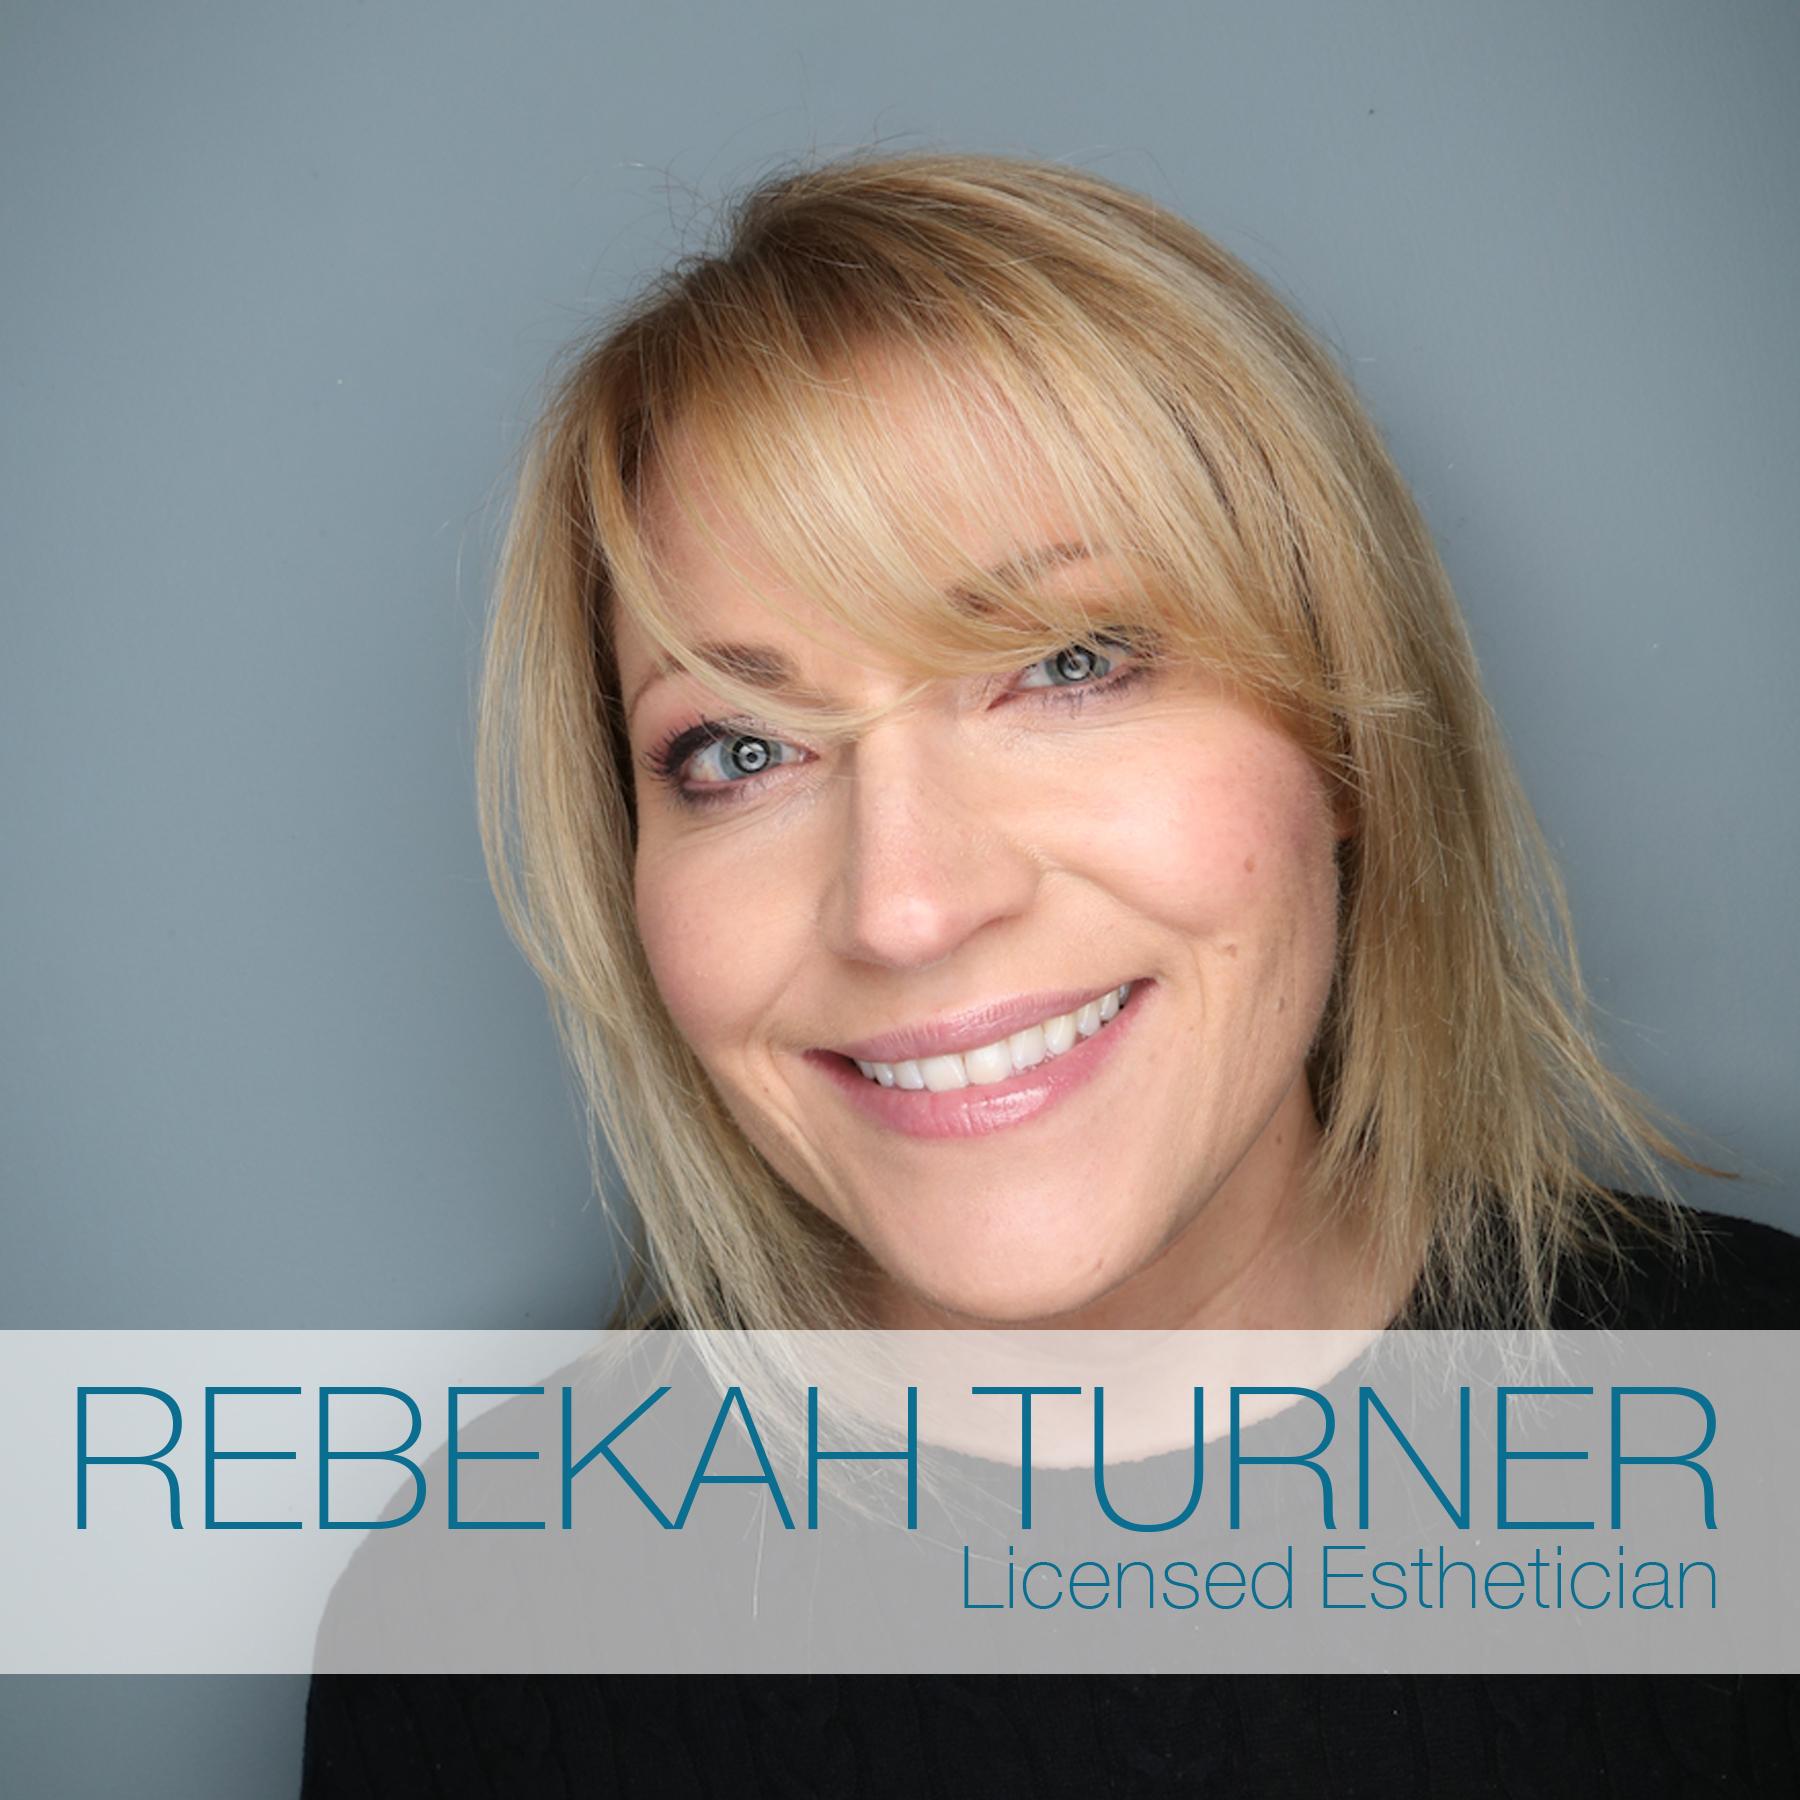 Rebekah Turner Licensed Esthetician